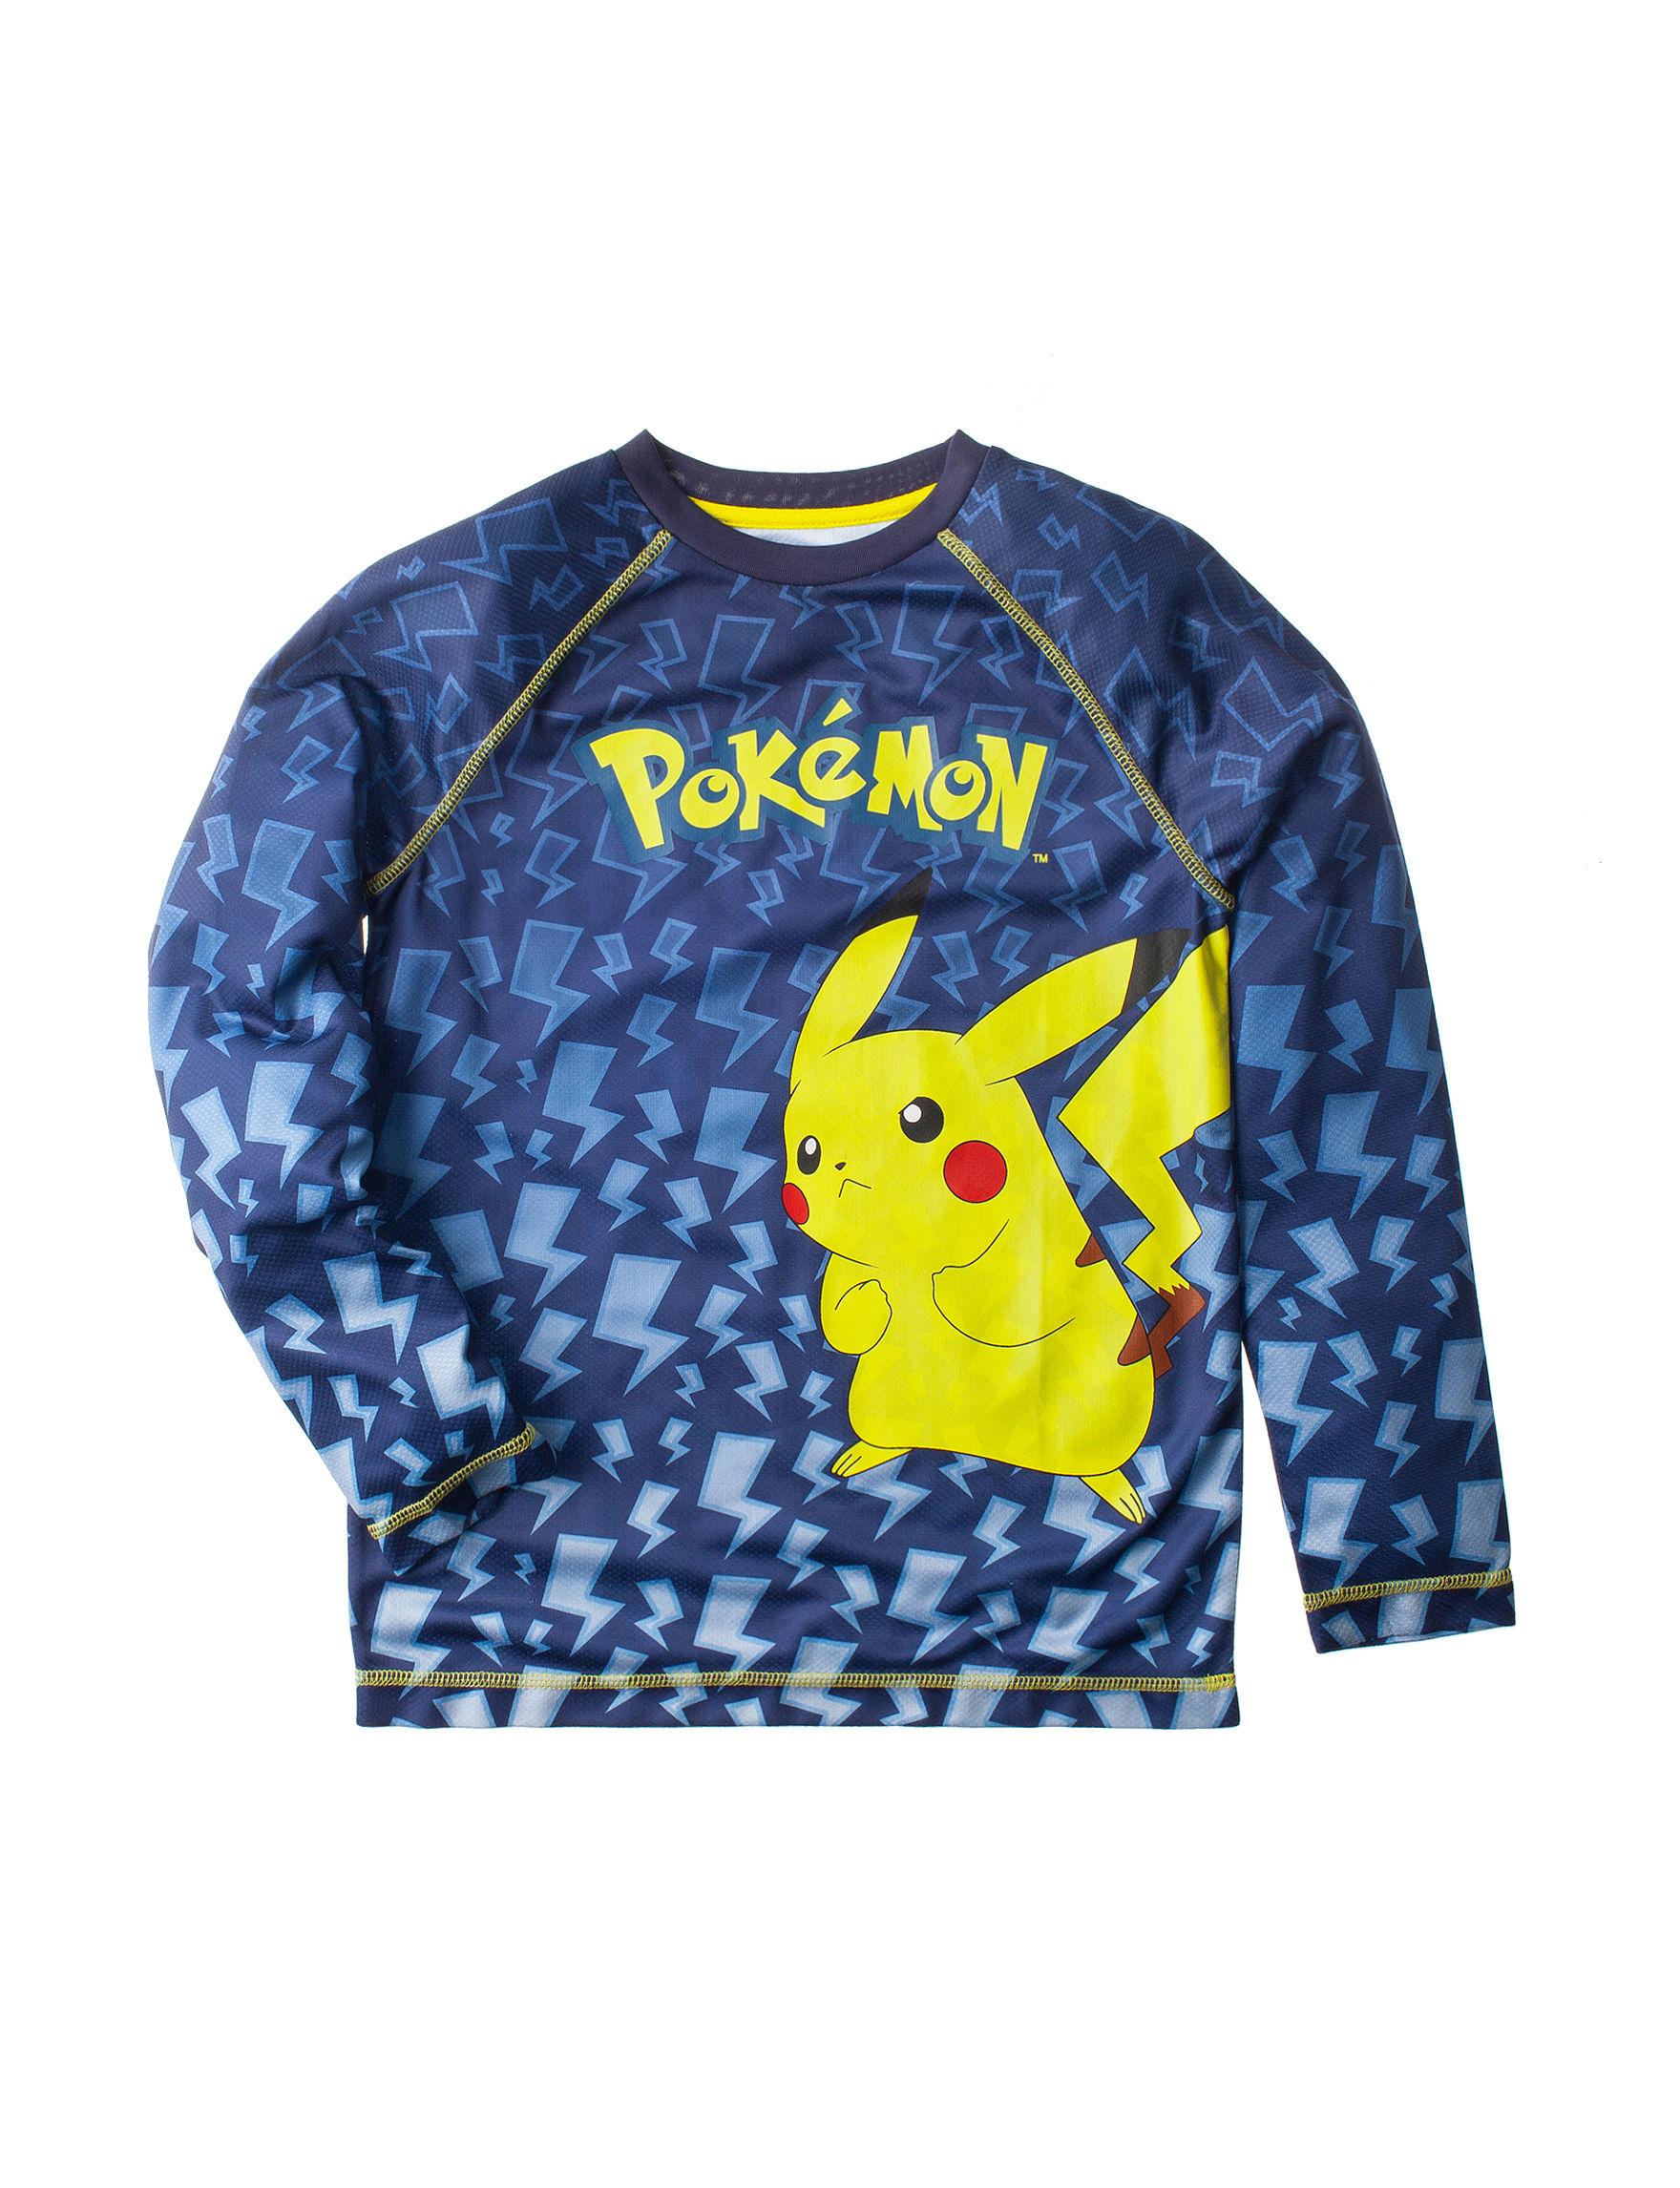 Pokemon Pikachu T Shirt Boys 8 20 Stage Stores